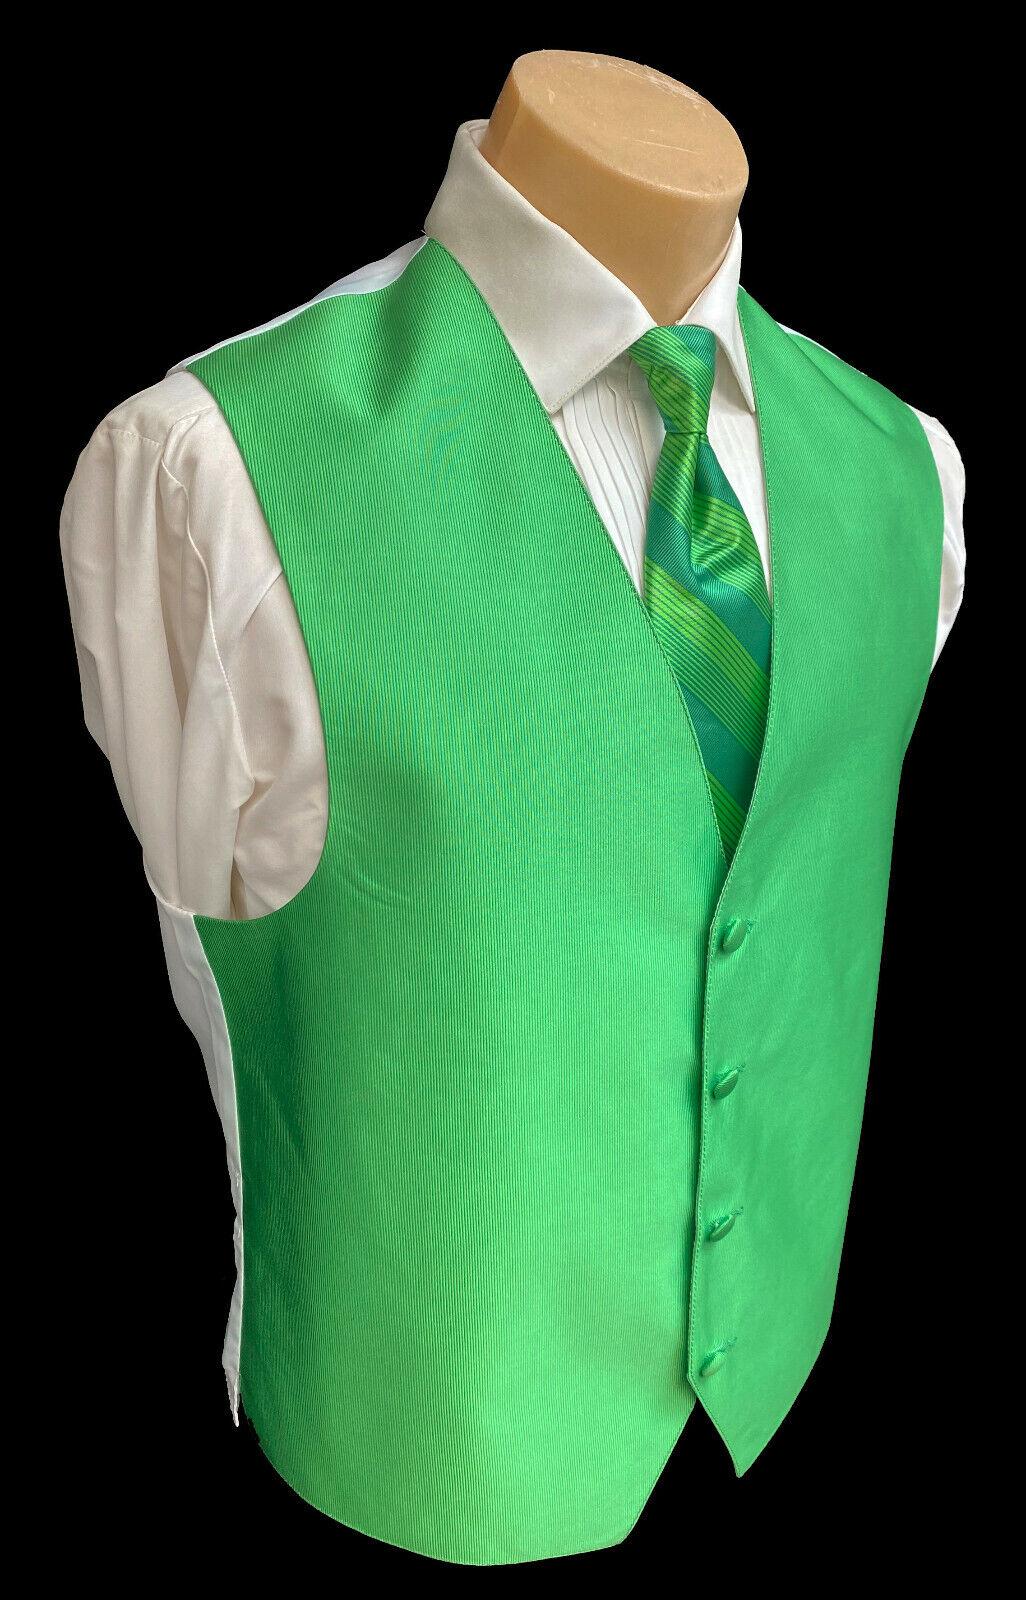 Men's Green Tuxedo Vest & Tie Fullback Cruise Wedding Party Groom Prom XL-Tall